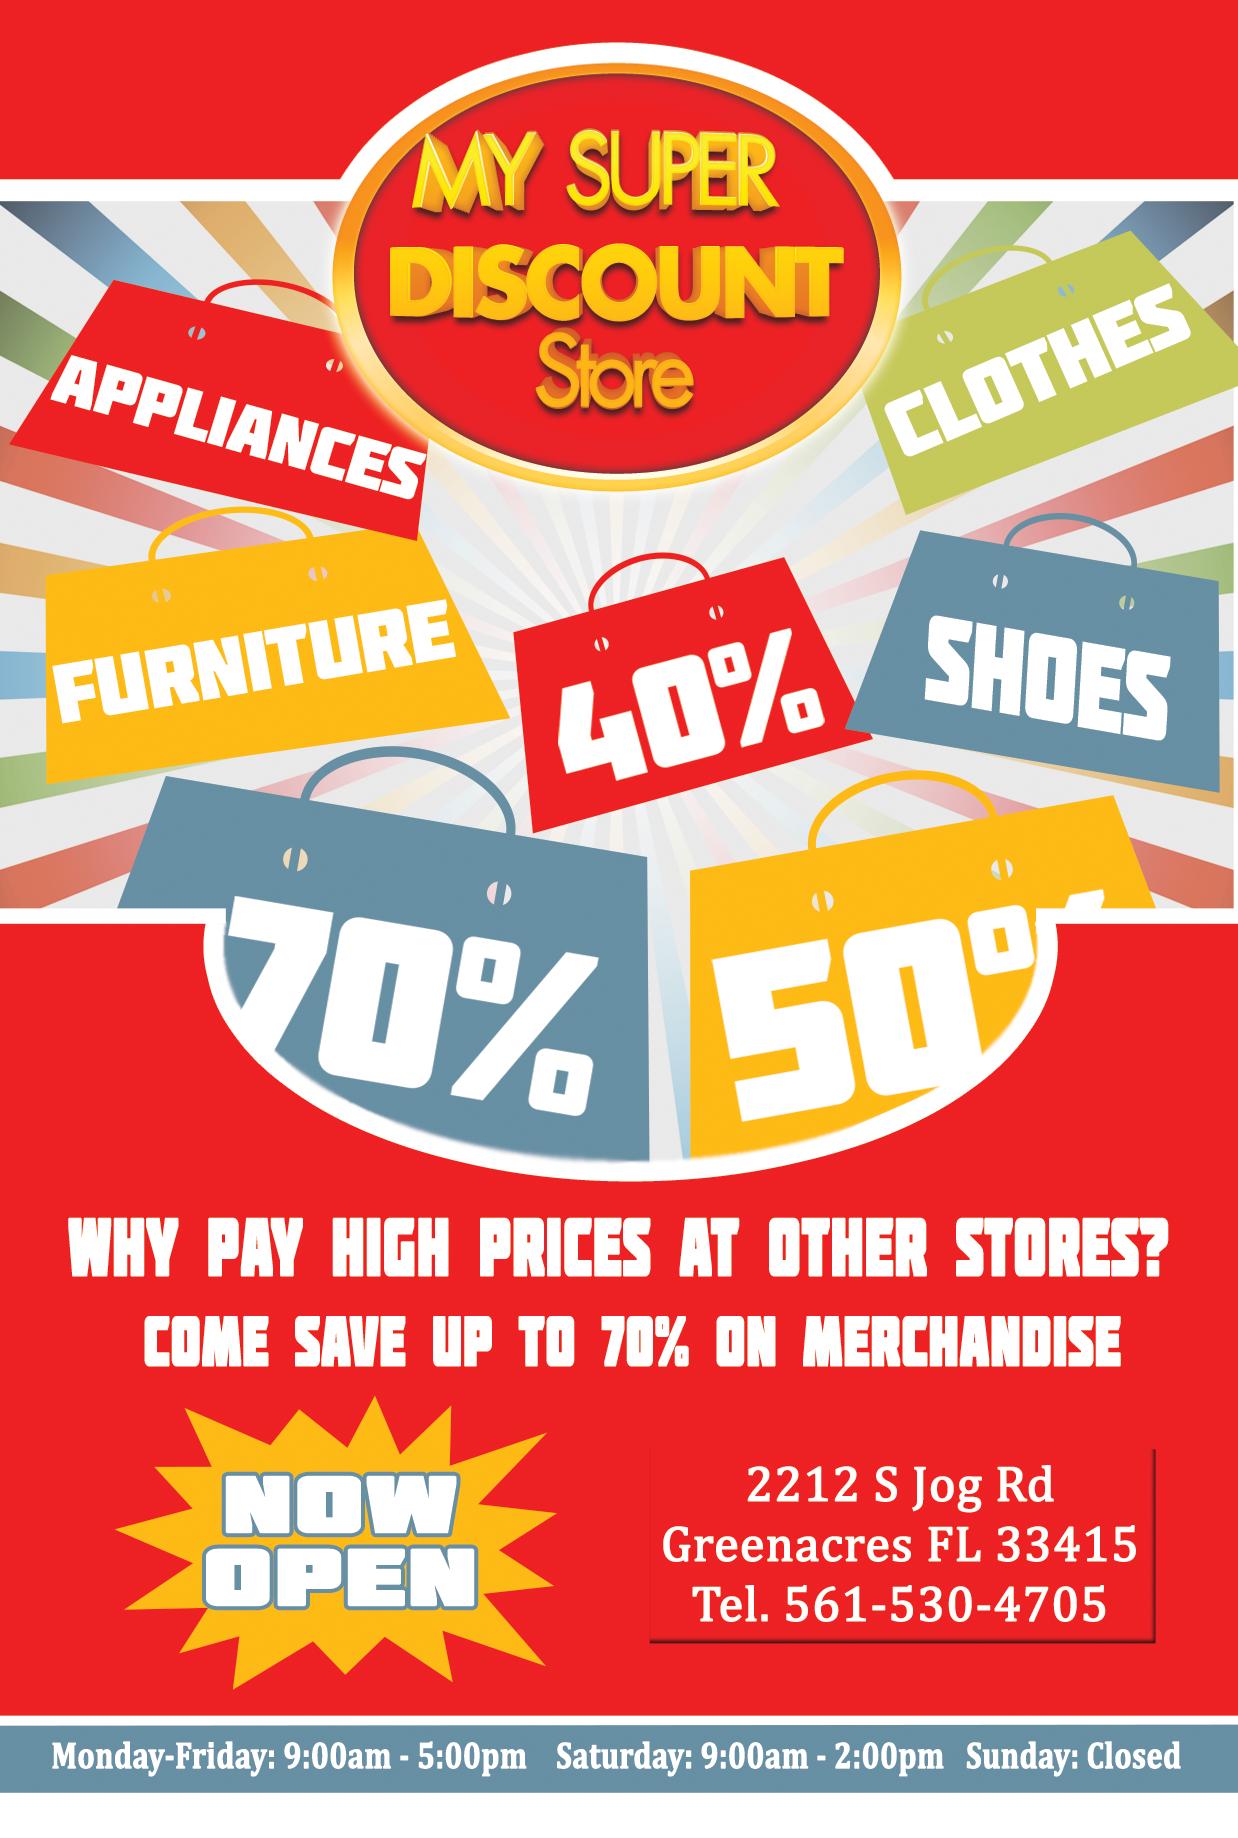 My Super Store Discount